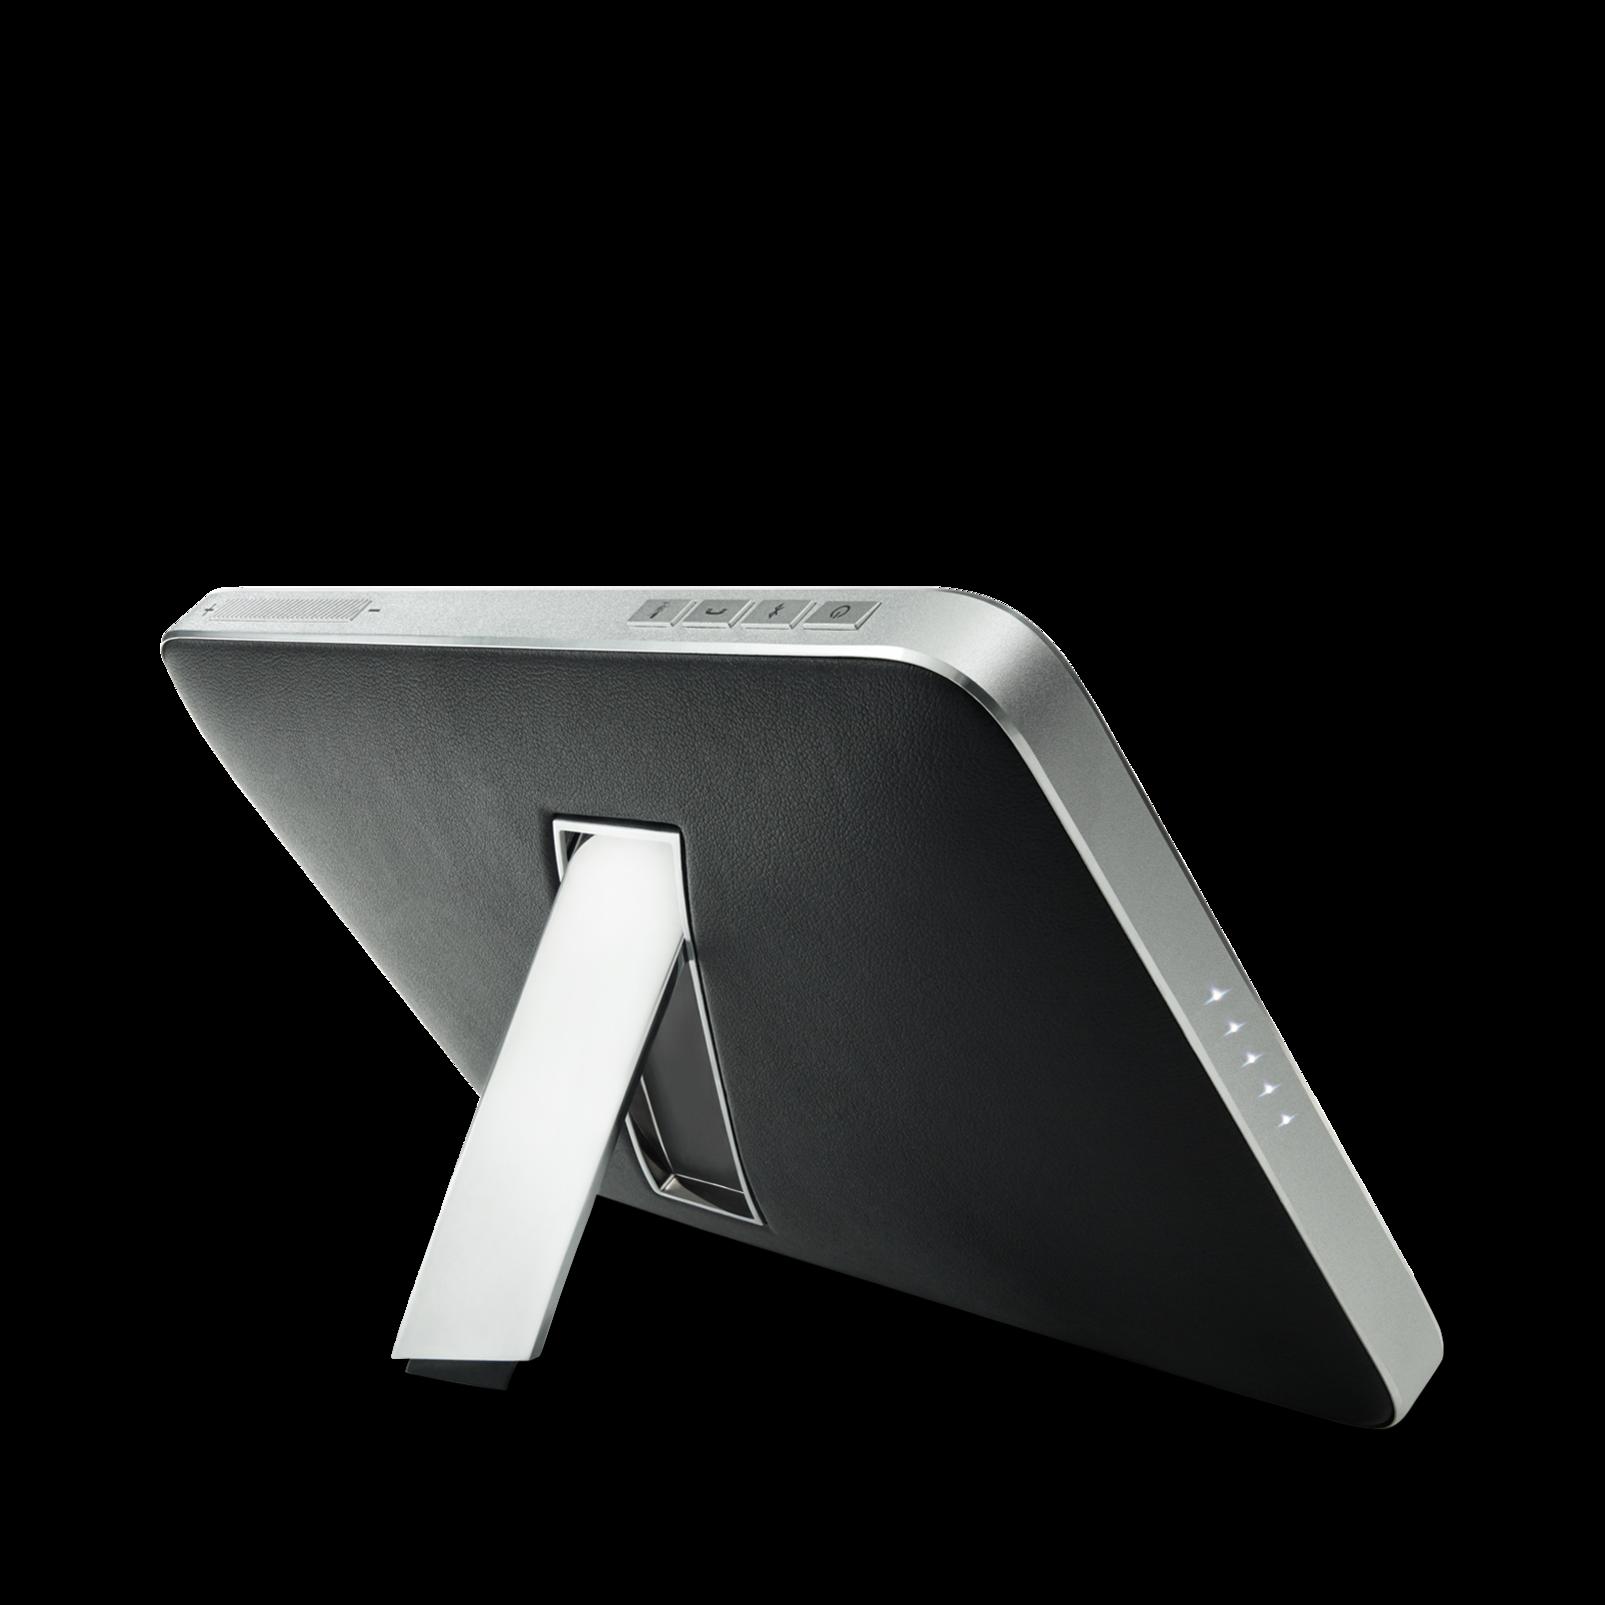 Esquire 2 - Black - Premium portable Bluetooth speaker with quad microphone conferencing system - Back